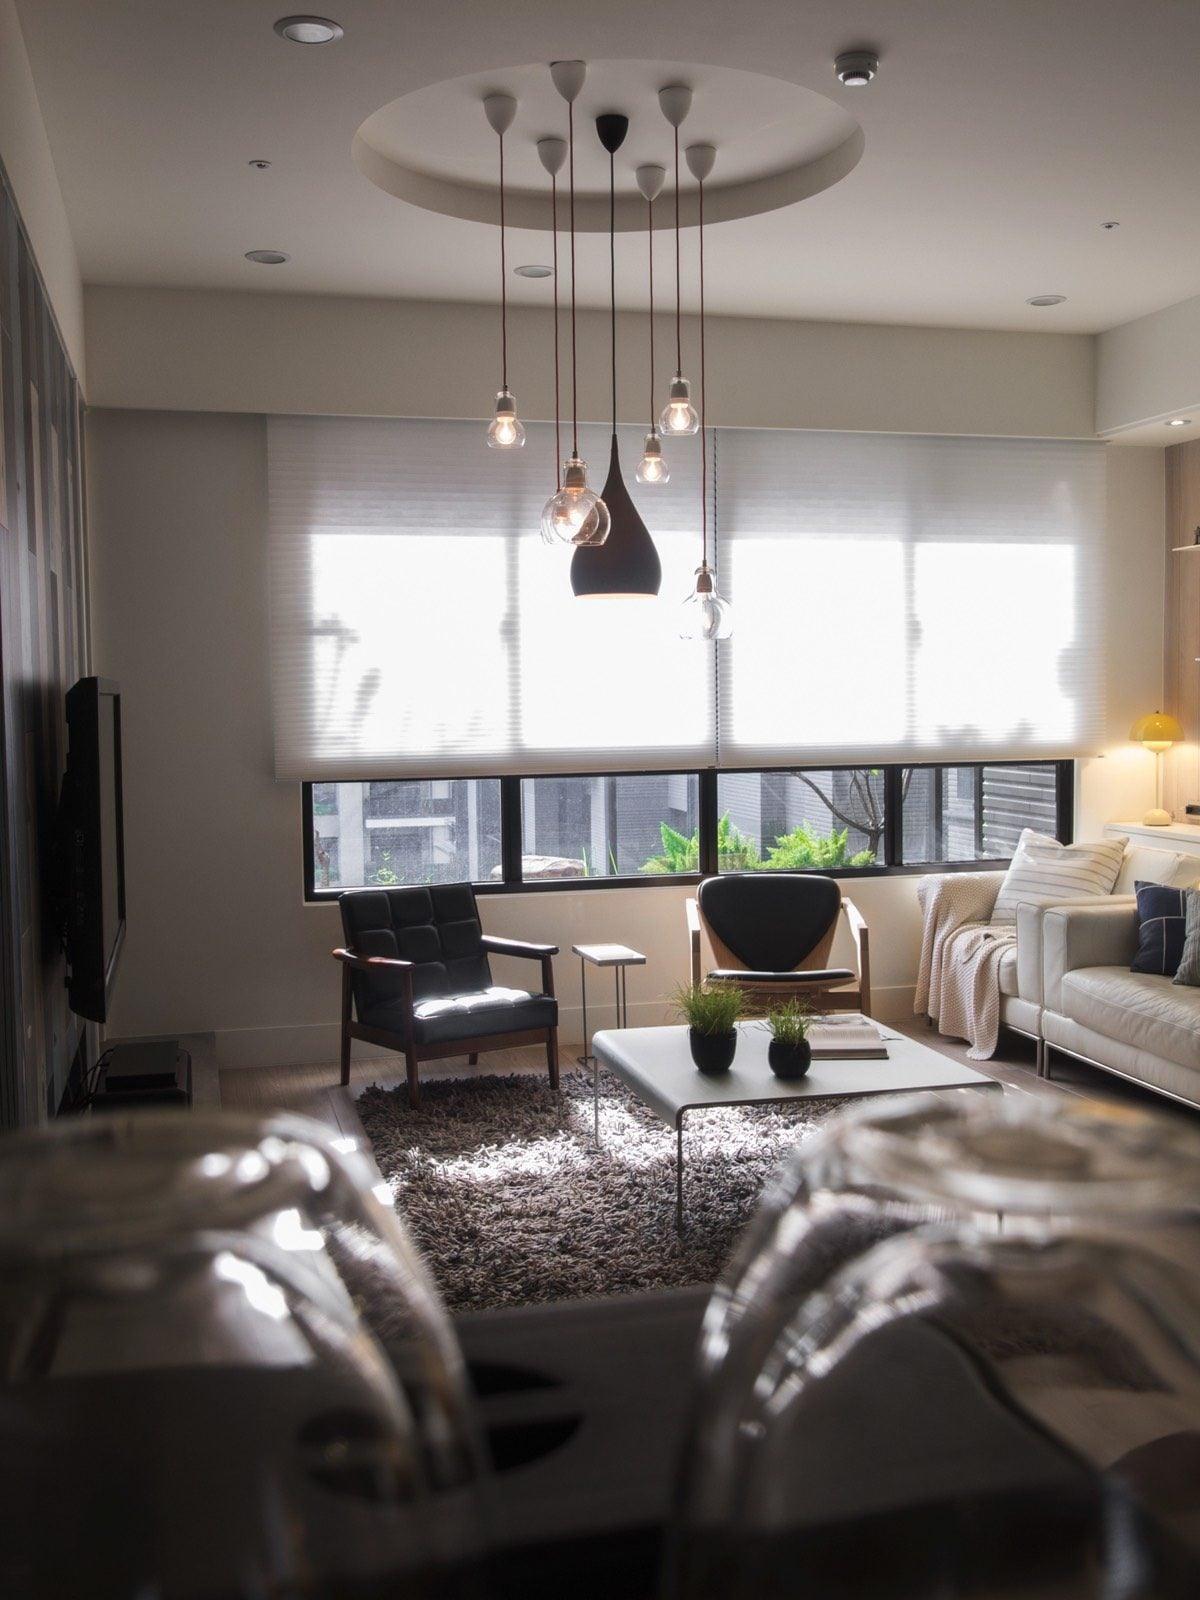 4modern-area-rug